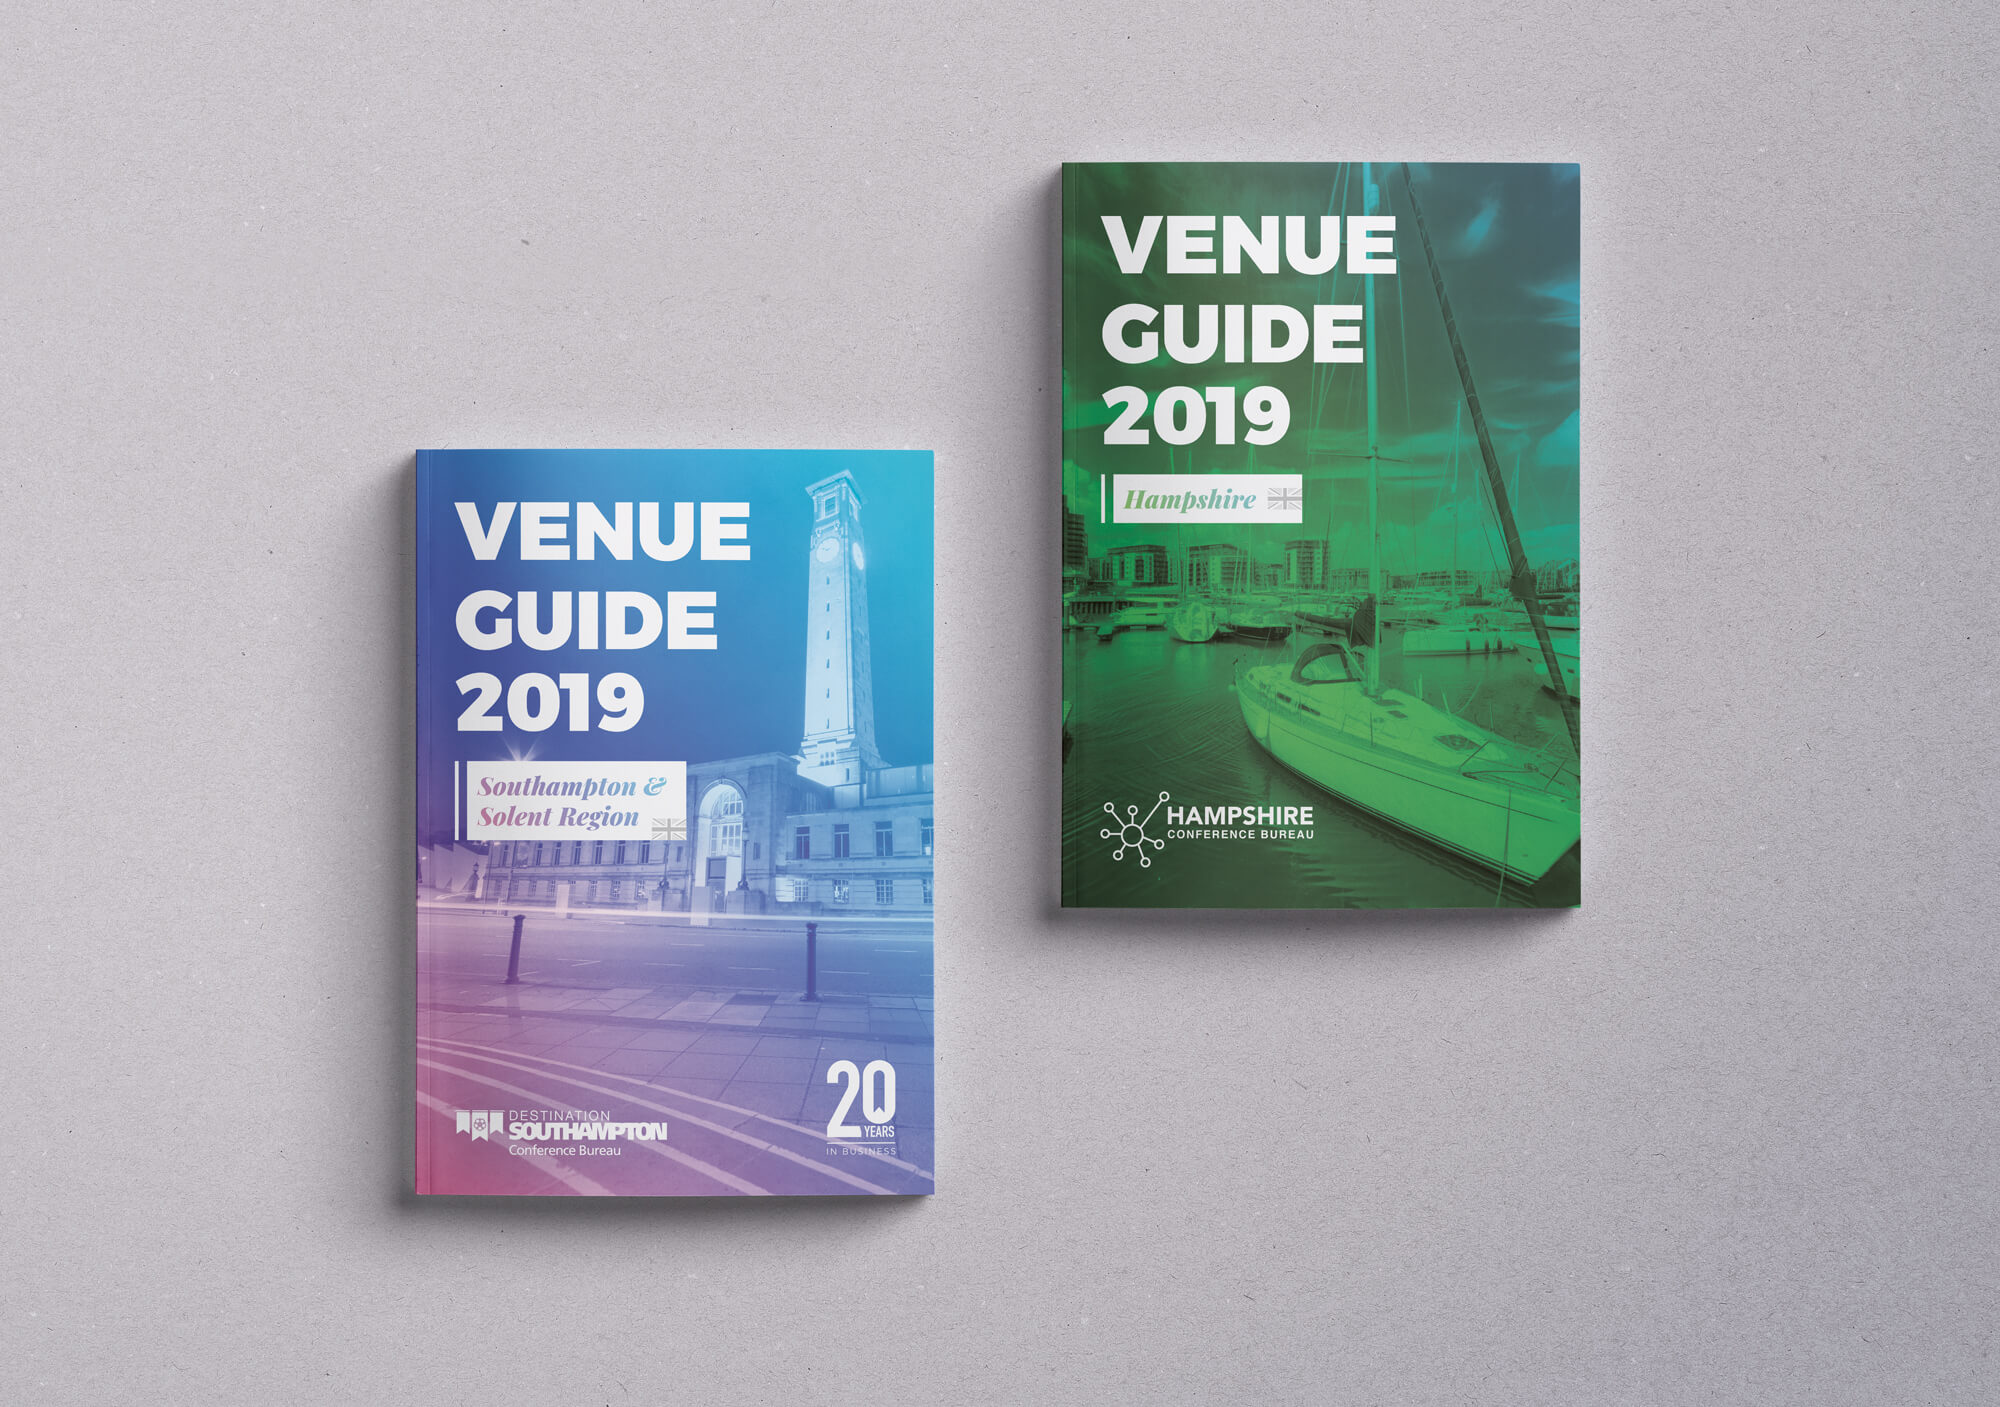 Hampshire Conference Bureau's 2019 Venue Guide